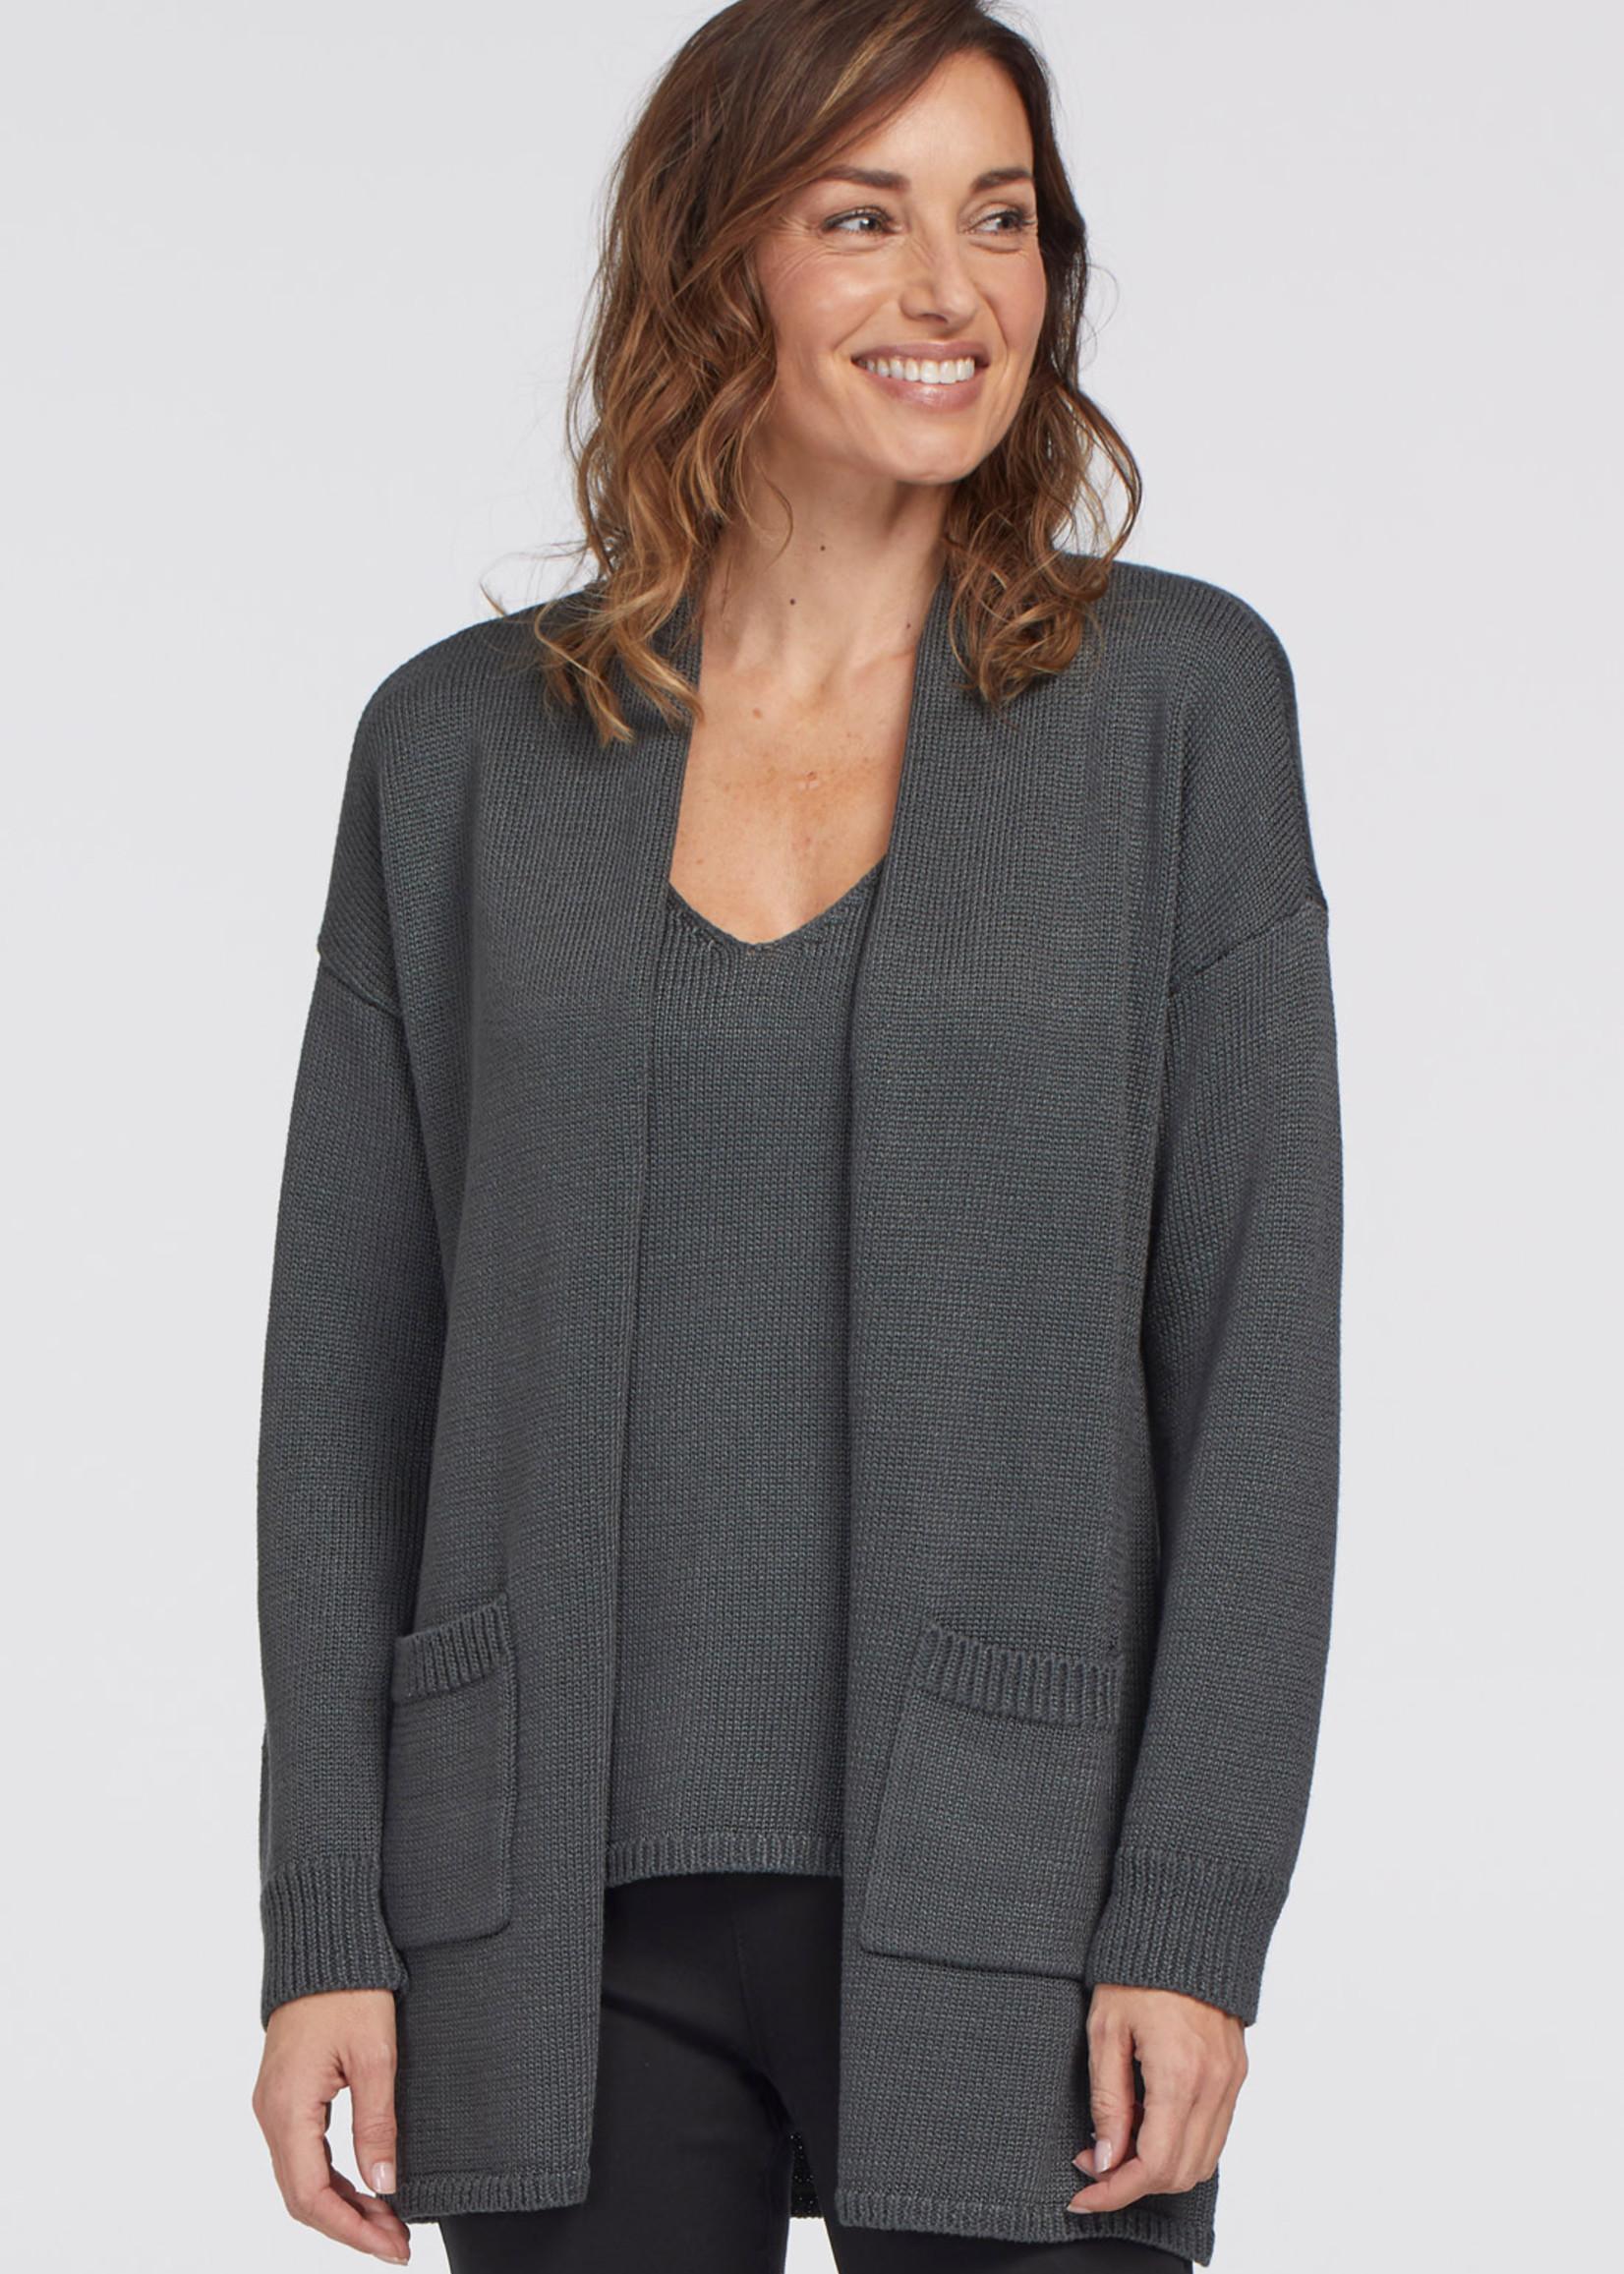 Tribal Long Sleeve Sweater Cardigan 71110-4338